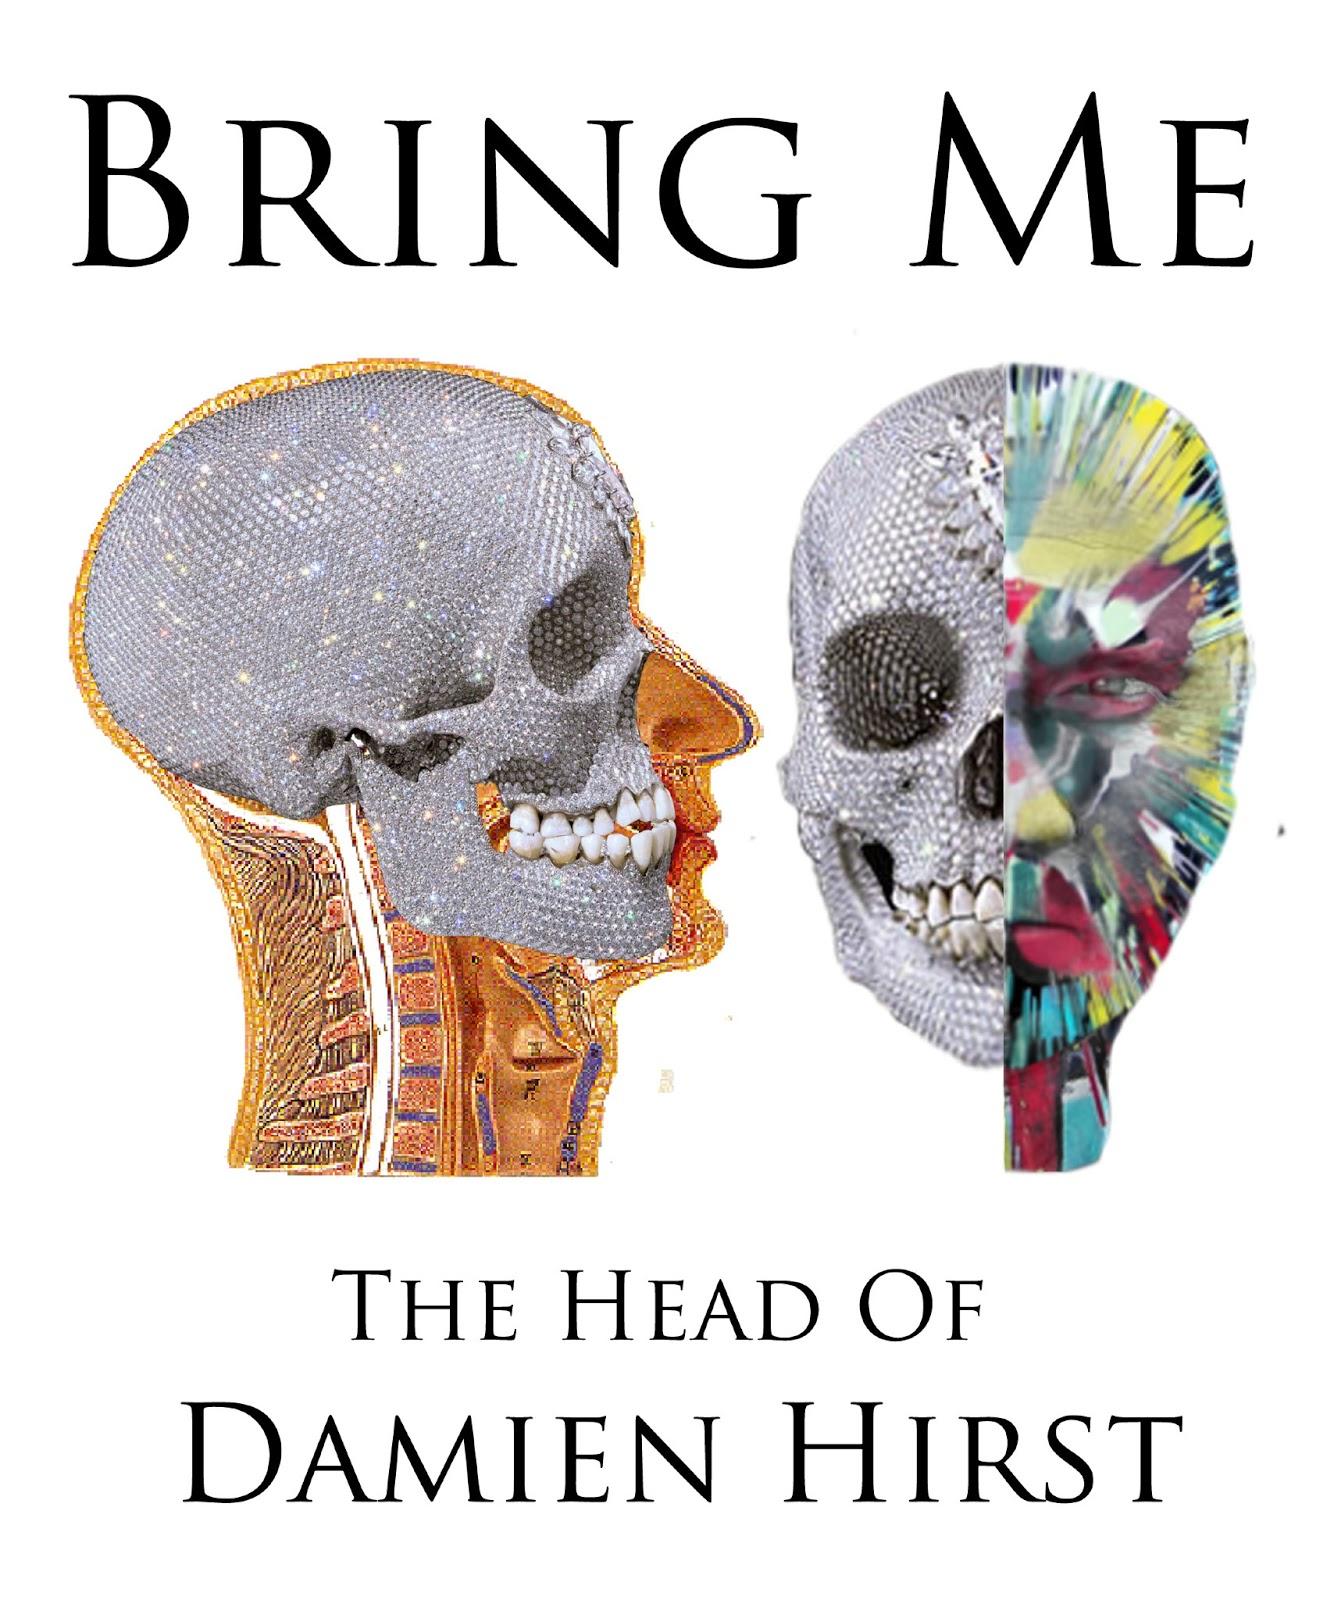 les éléments - Page 15 Bring+me+the+head+of+damien+hirst+poster